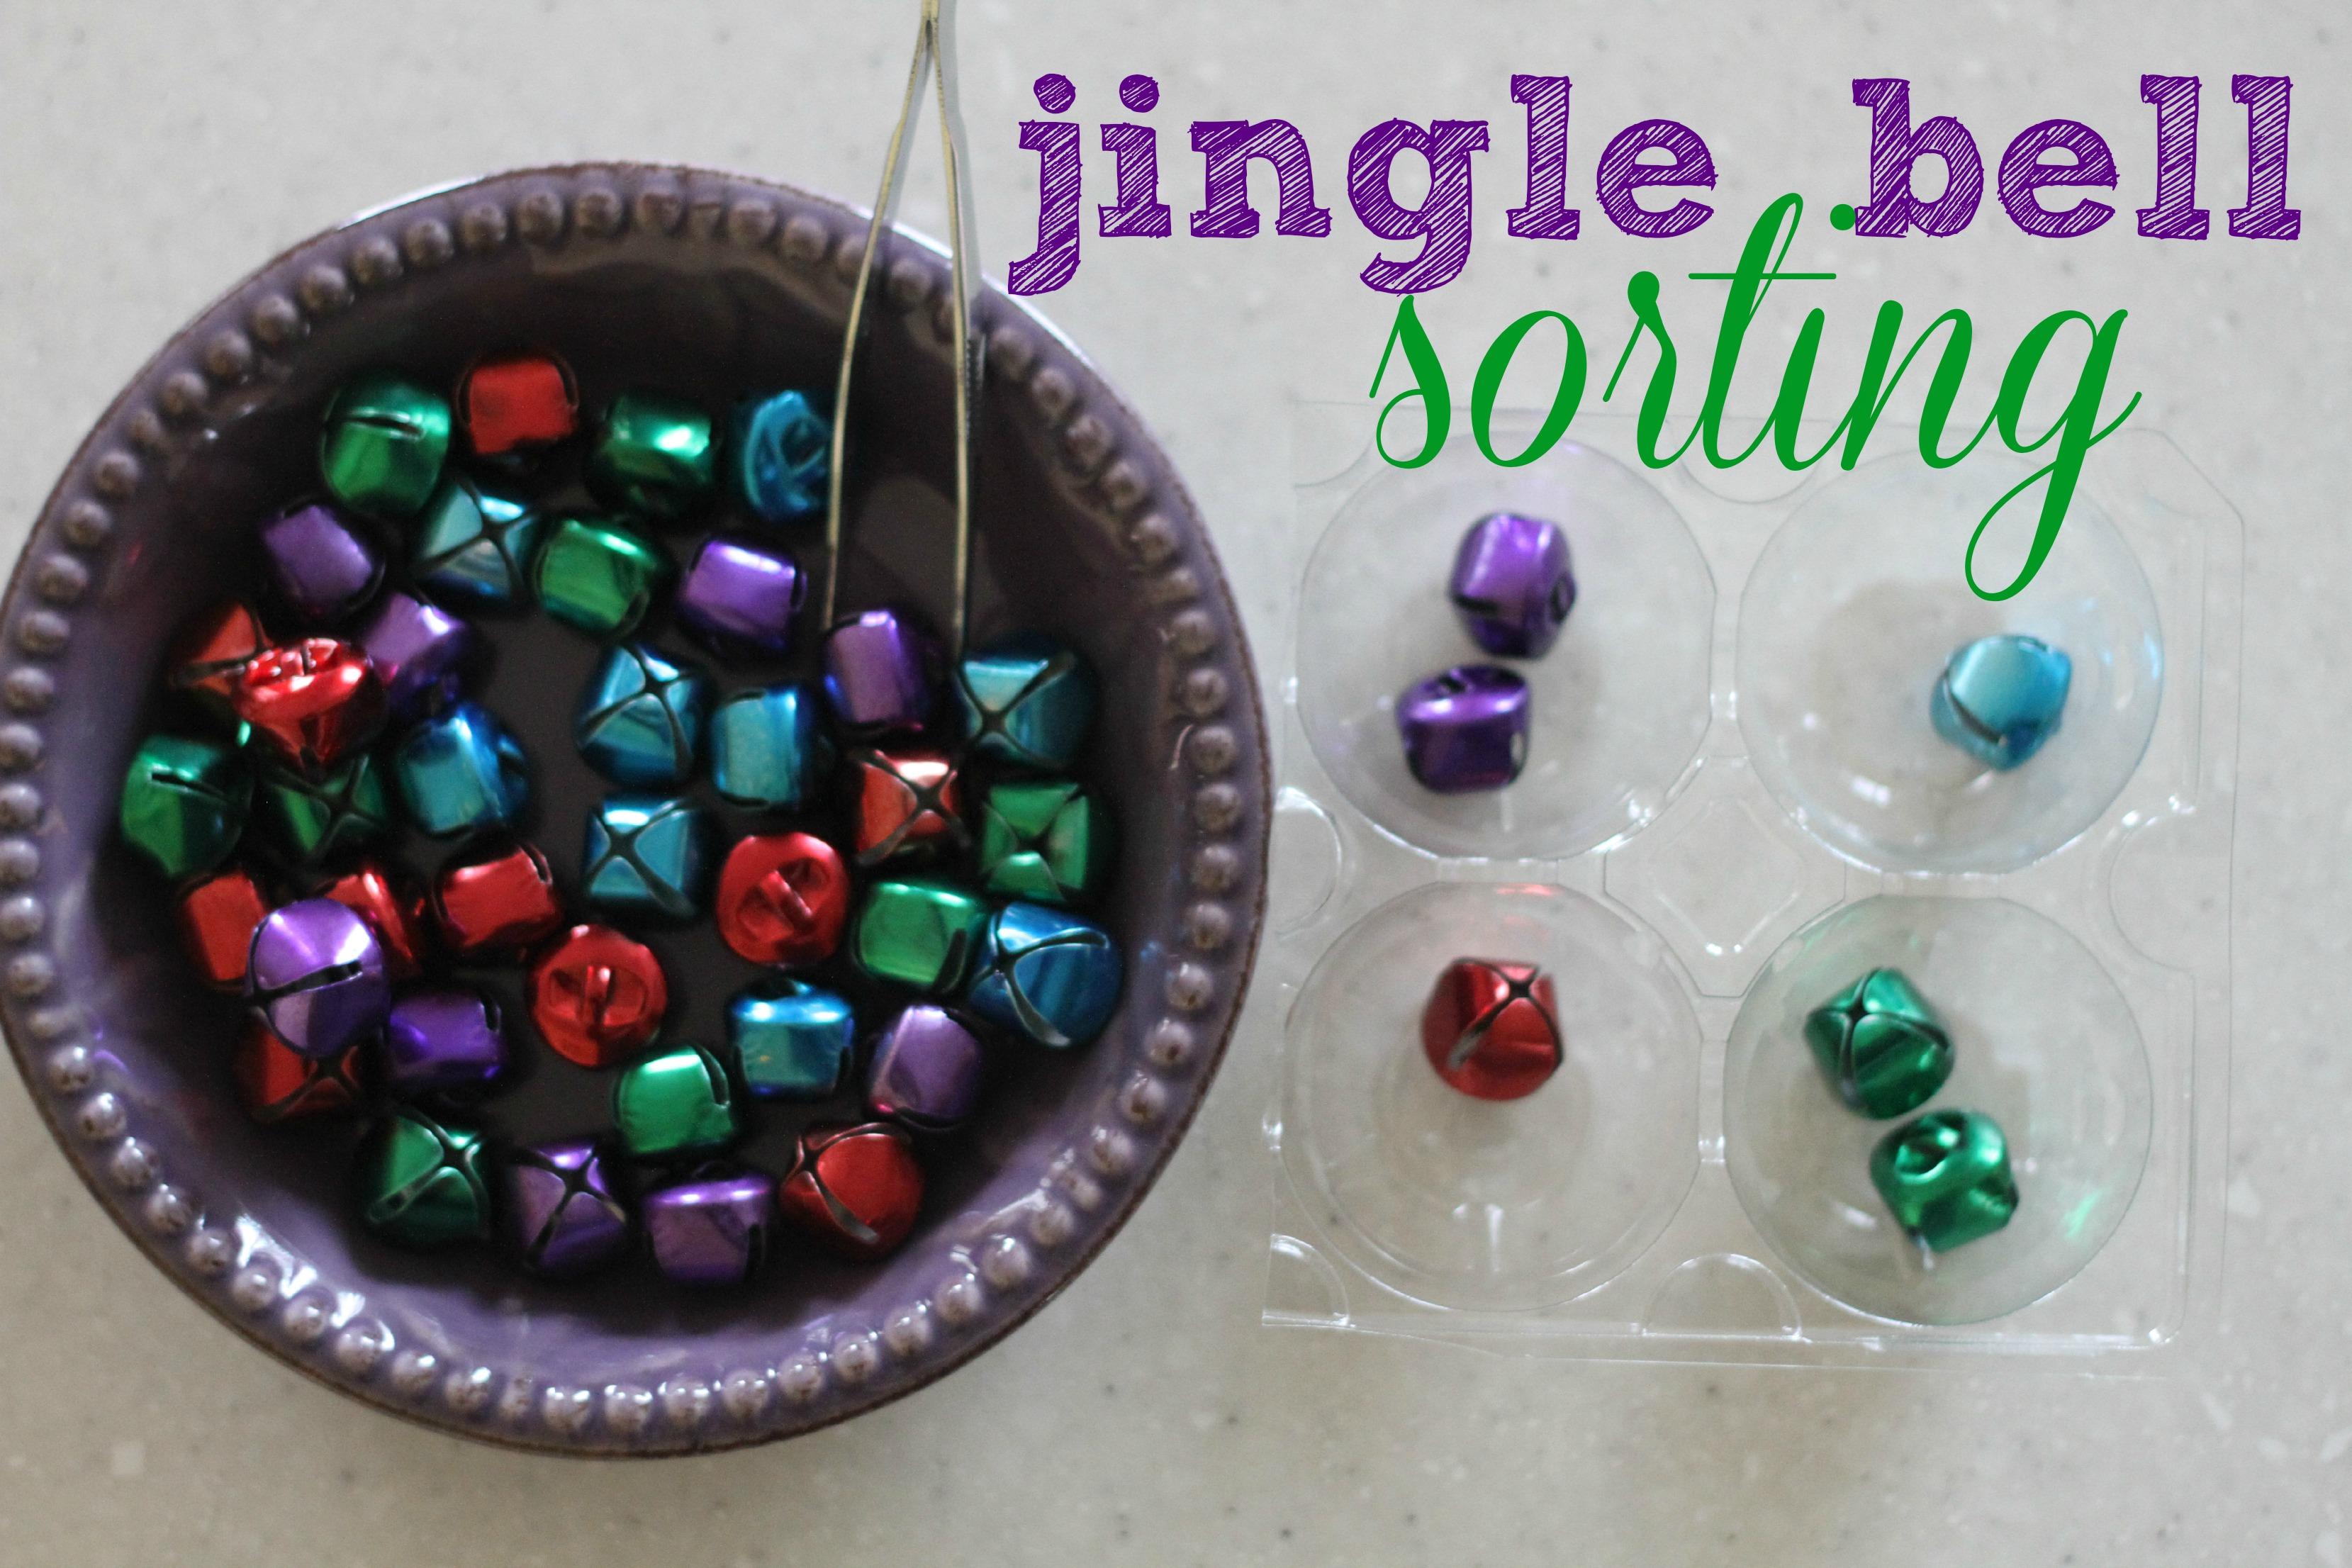 Jingle Bell Sorting